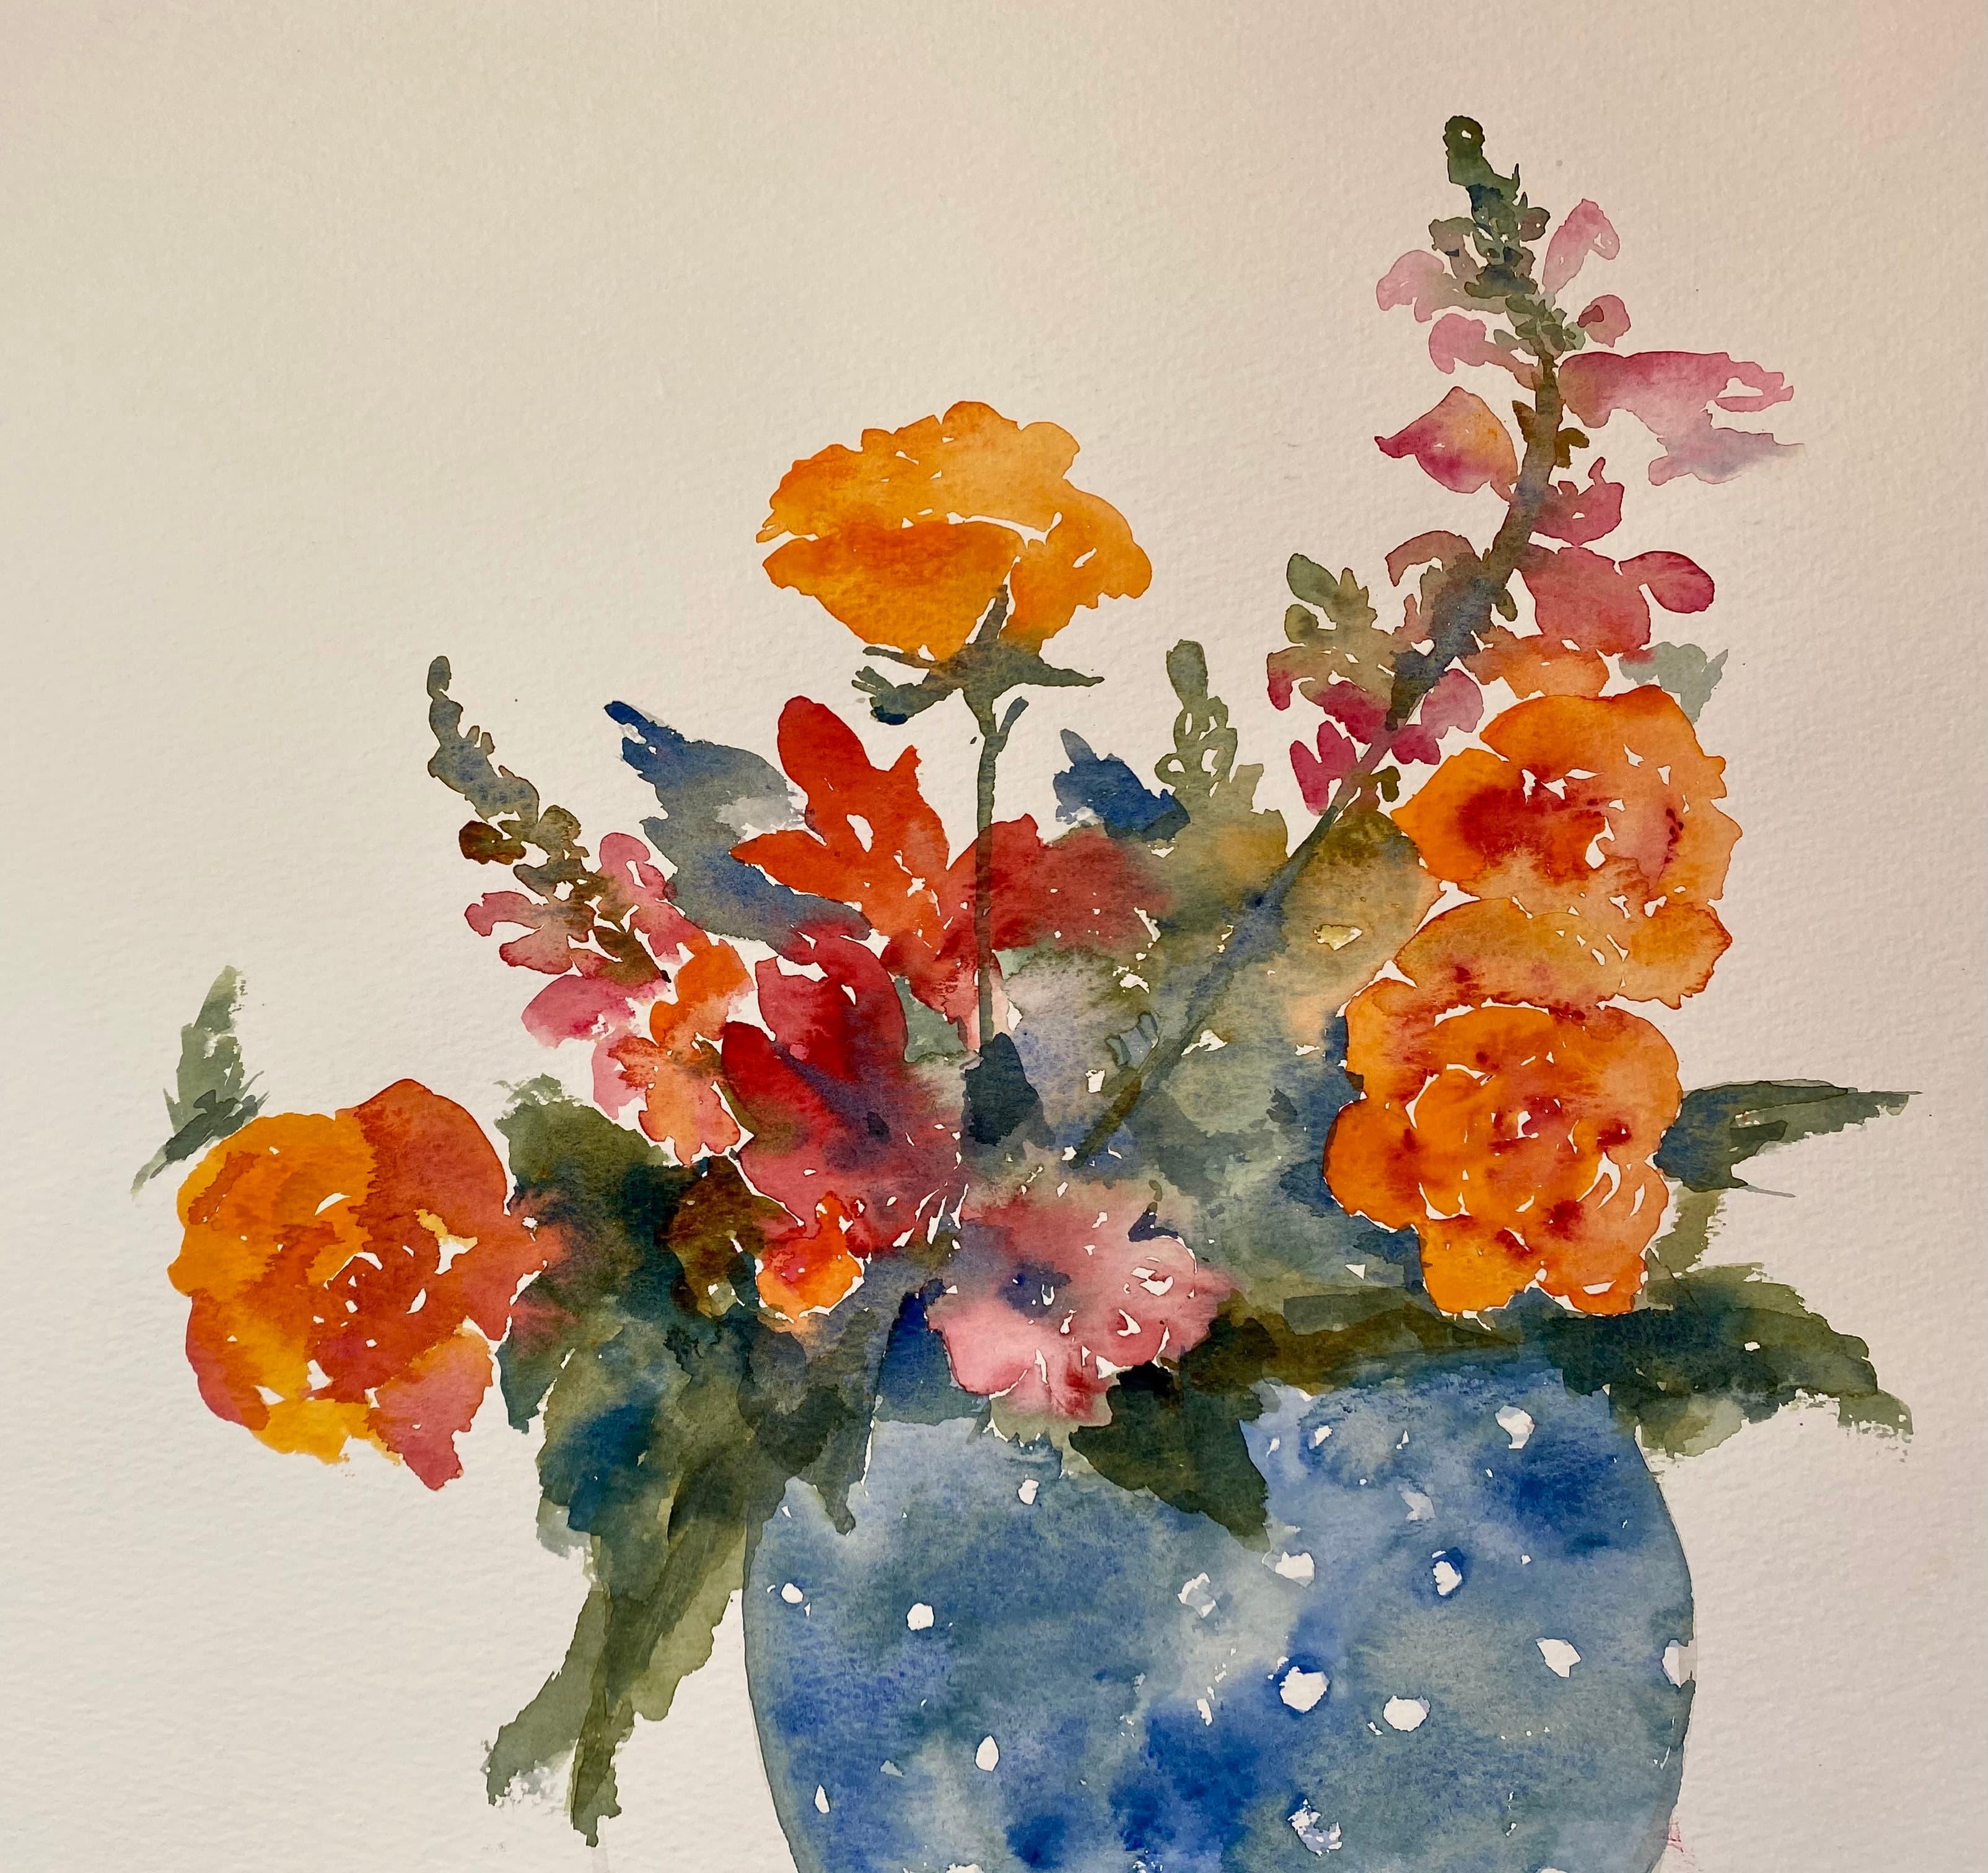 watercolour painting orange flowers blue jug